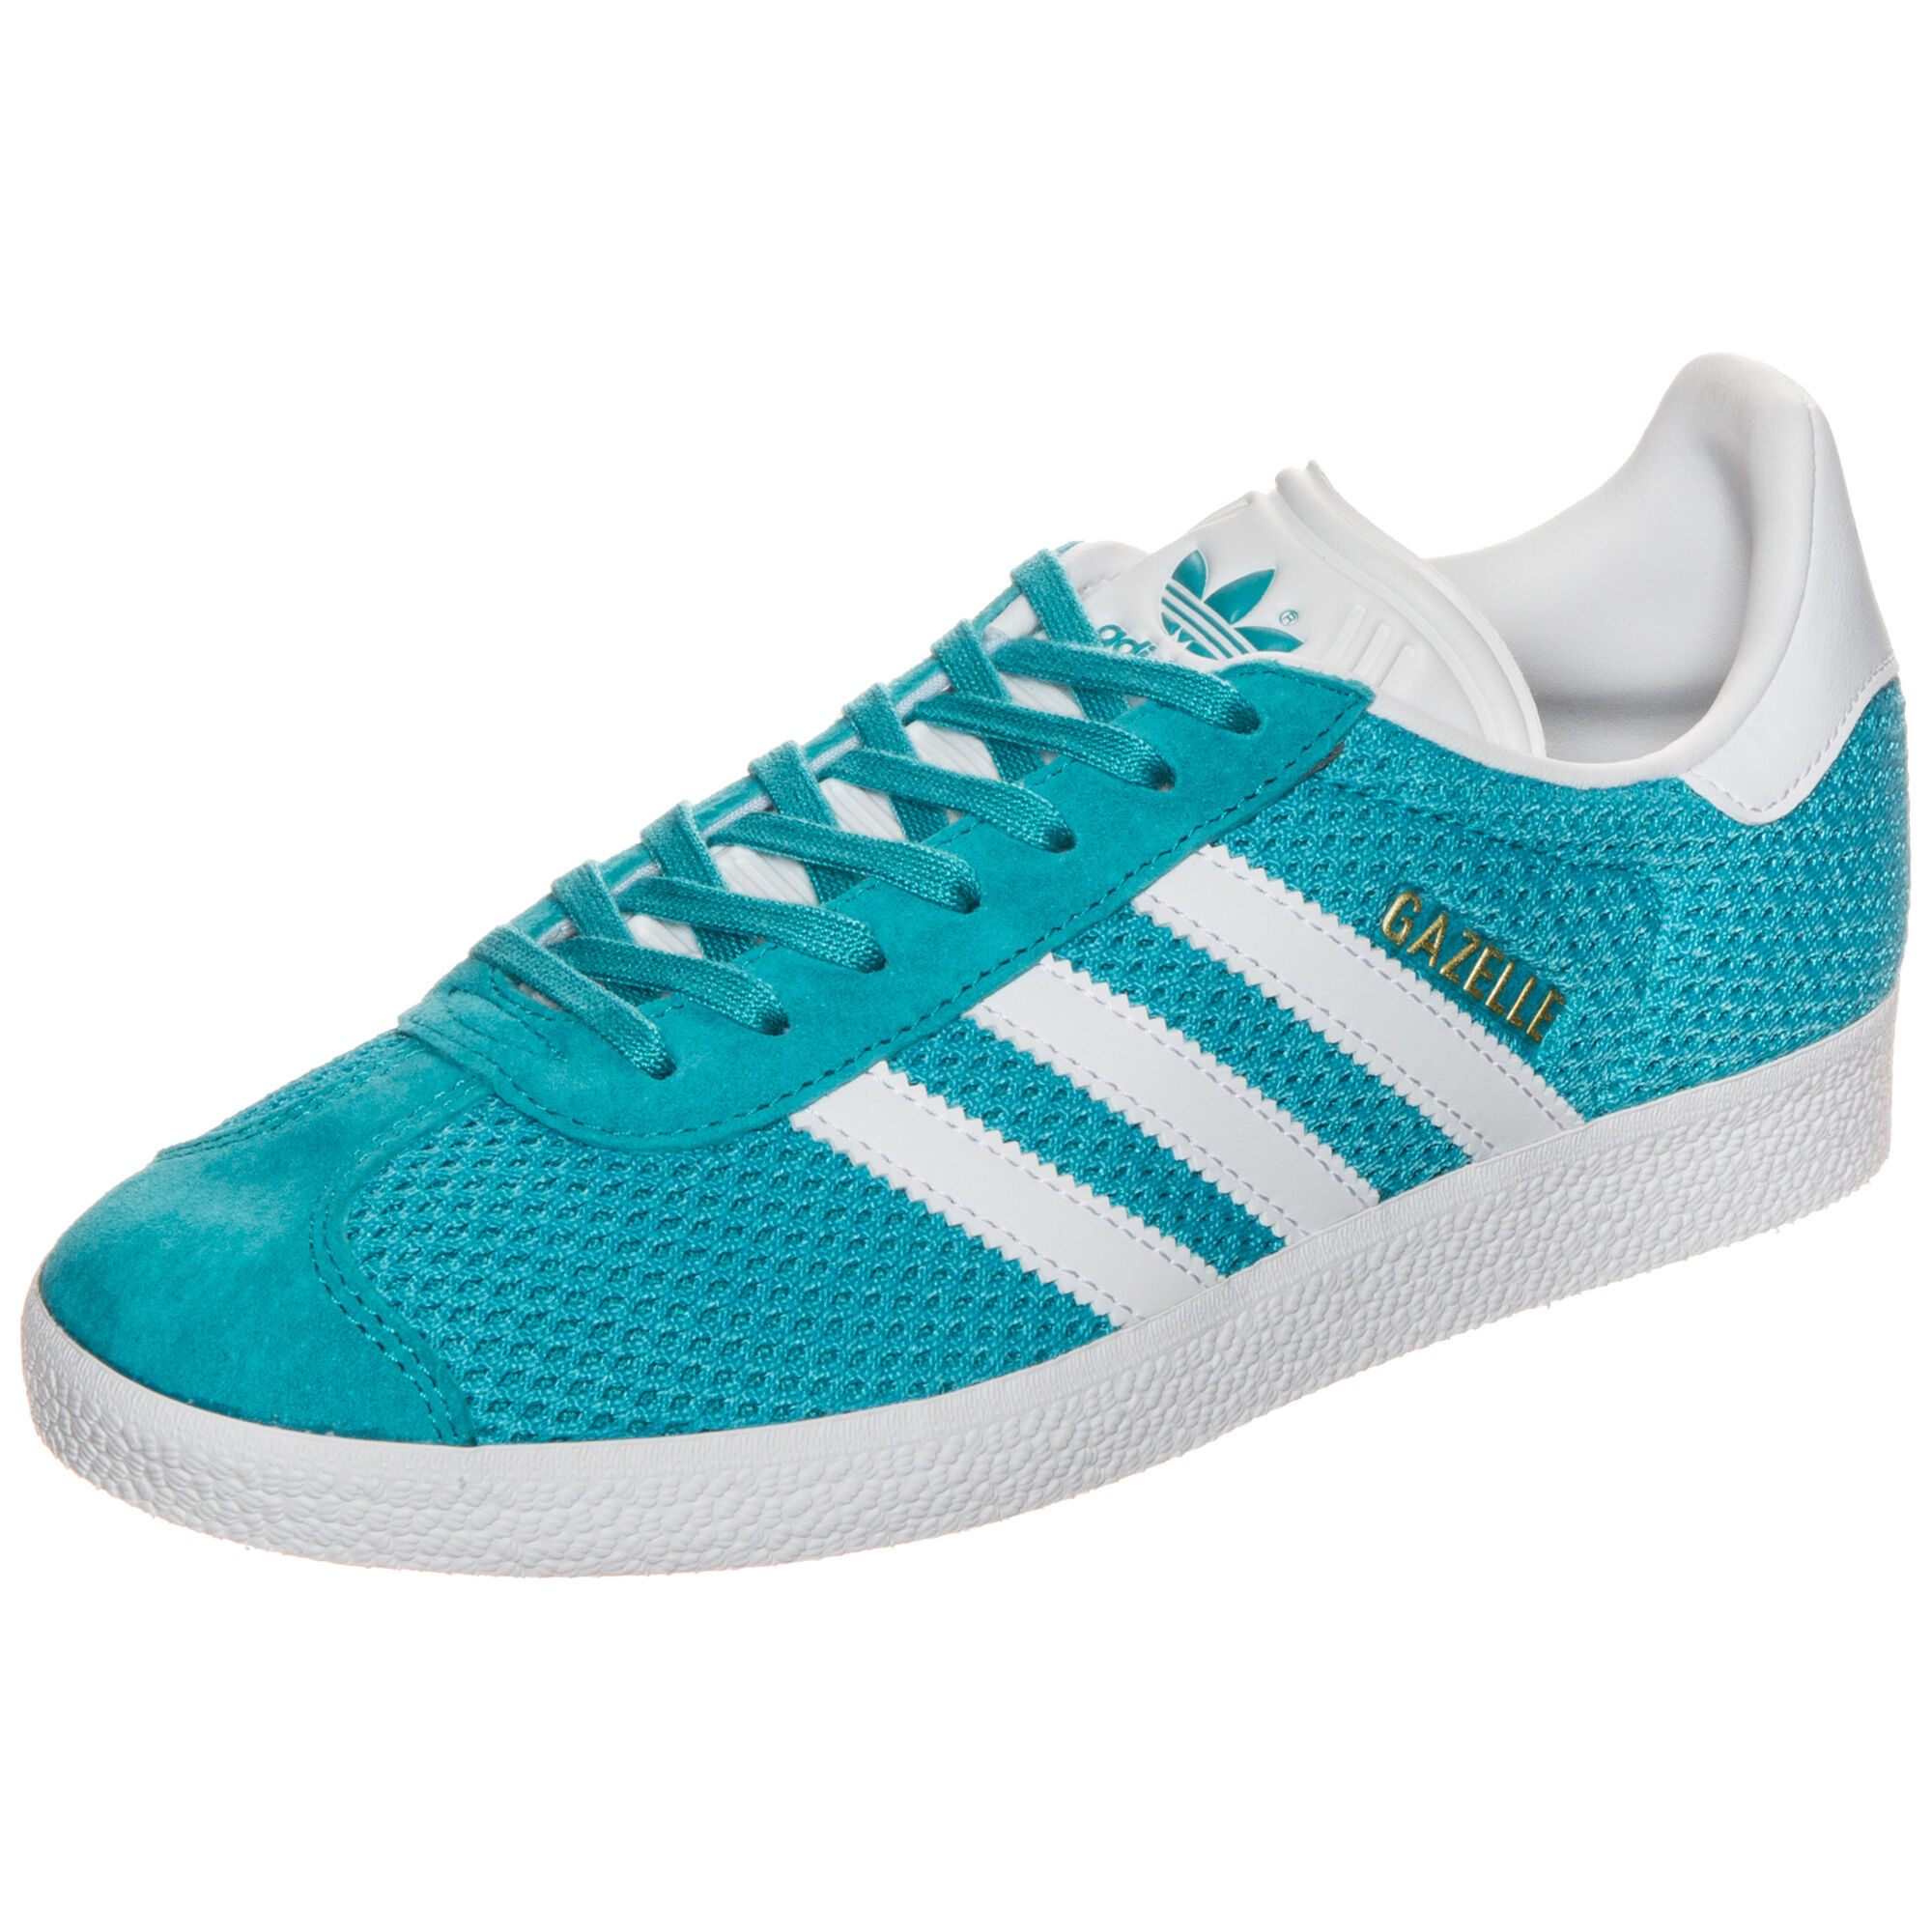 adidas Gazelle | Sneaker Shop Lifestyle bei OUTFITTER